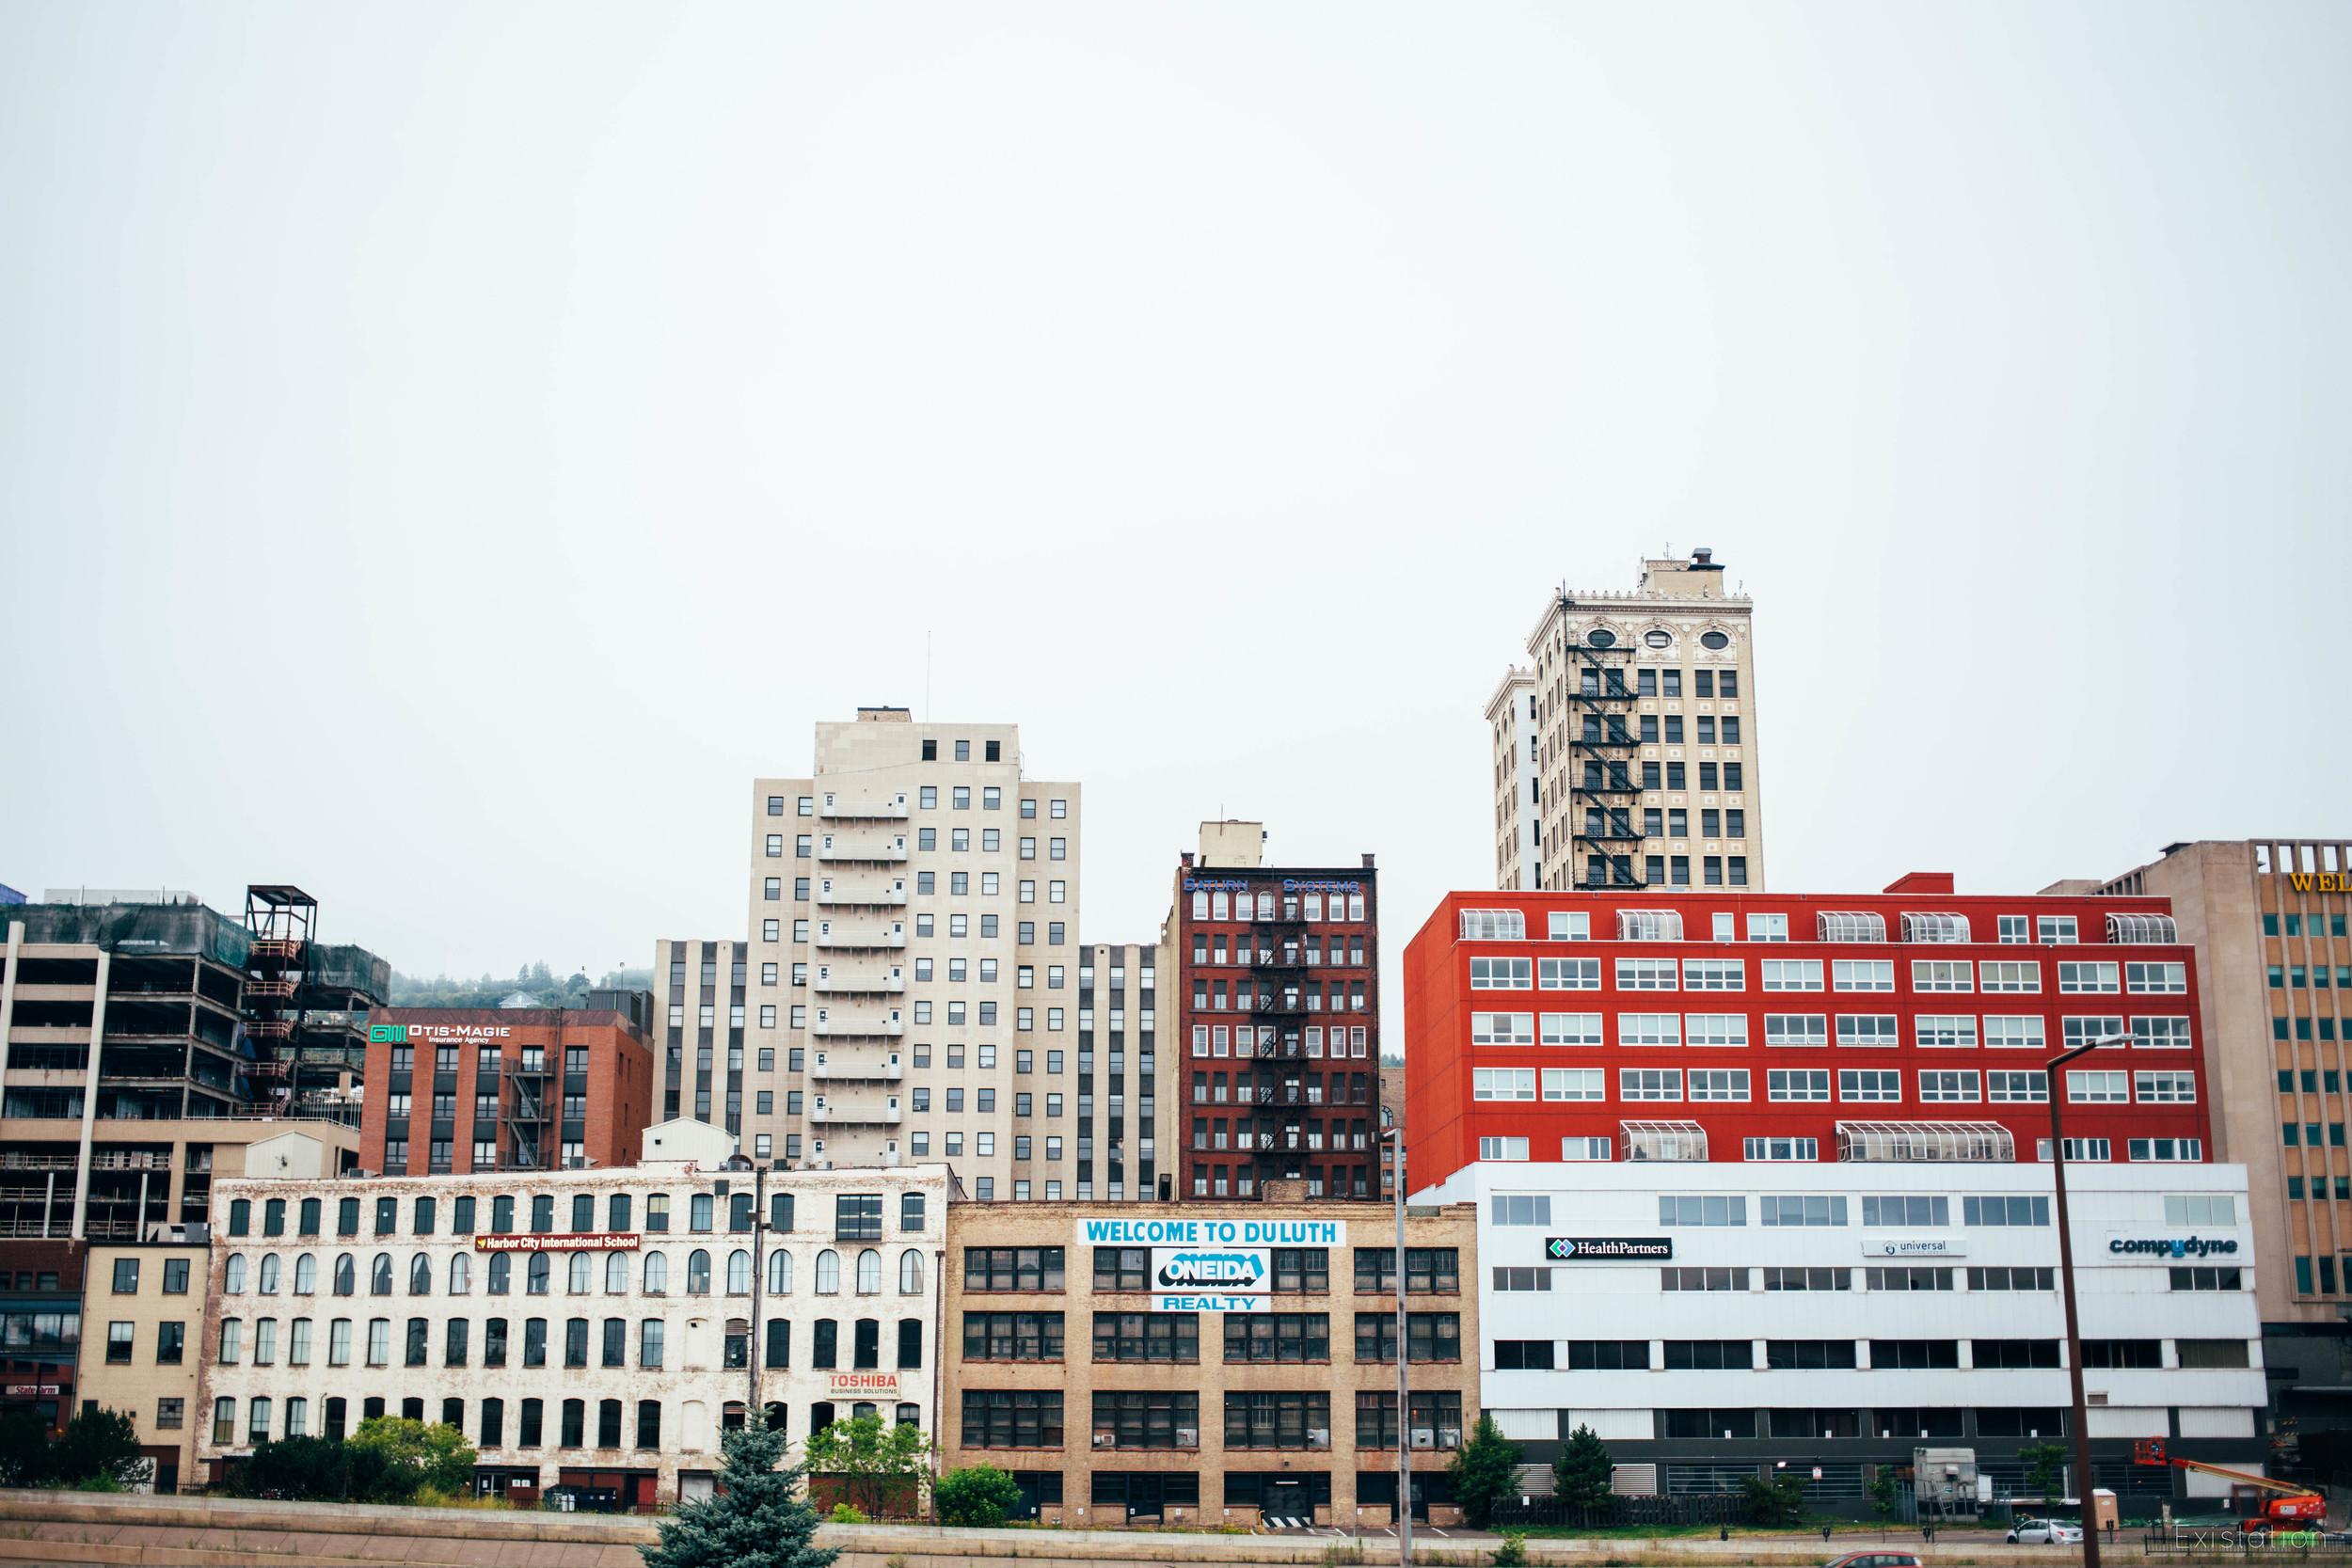 downtown duluth minnesota.jpg